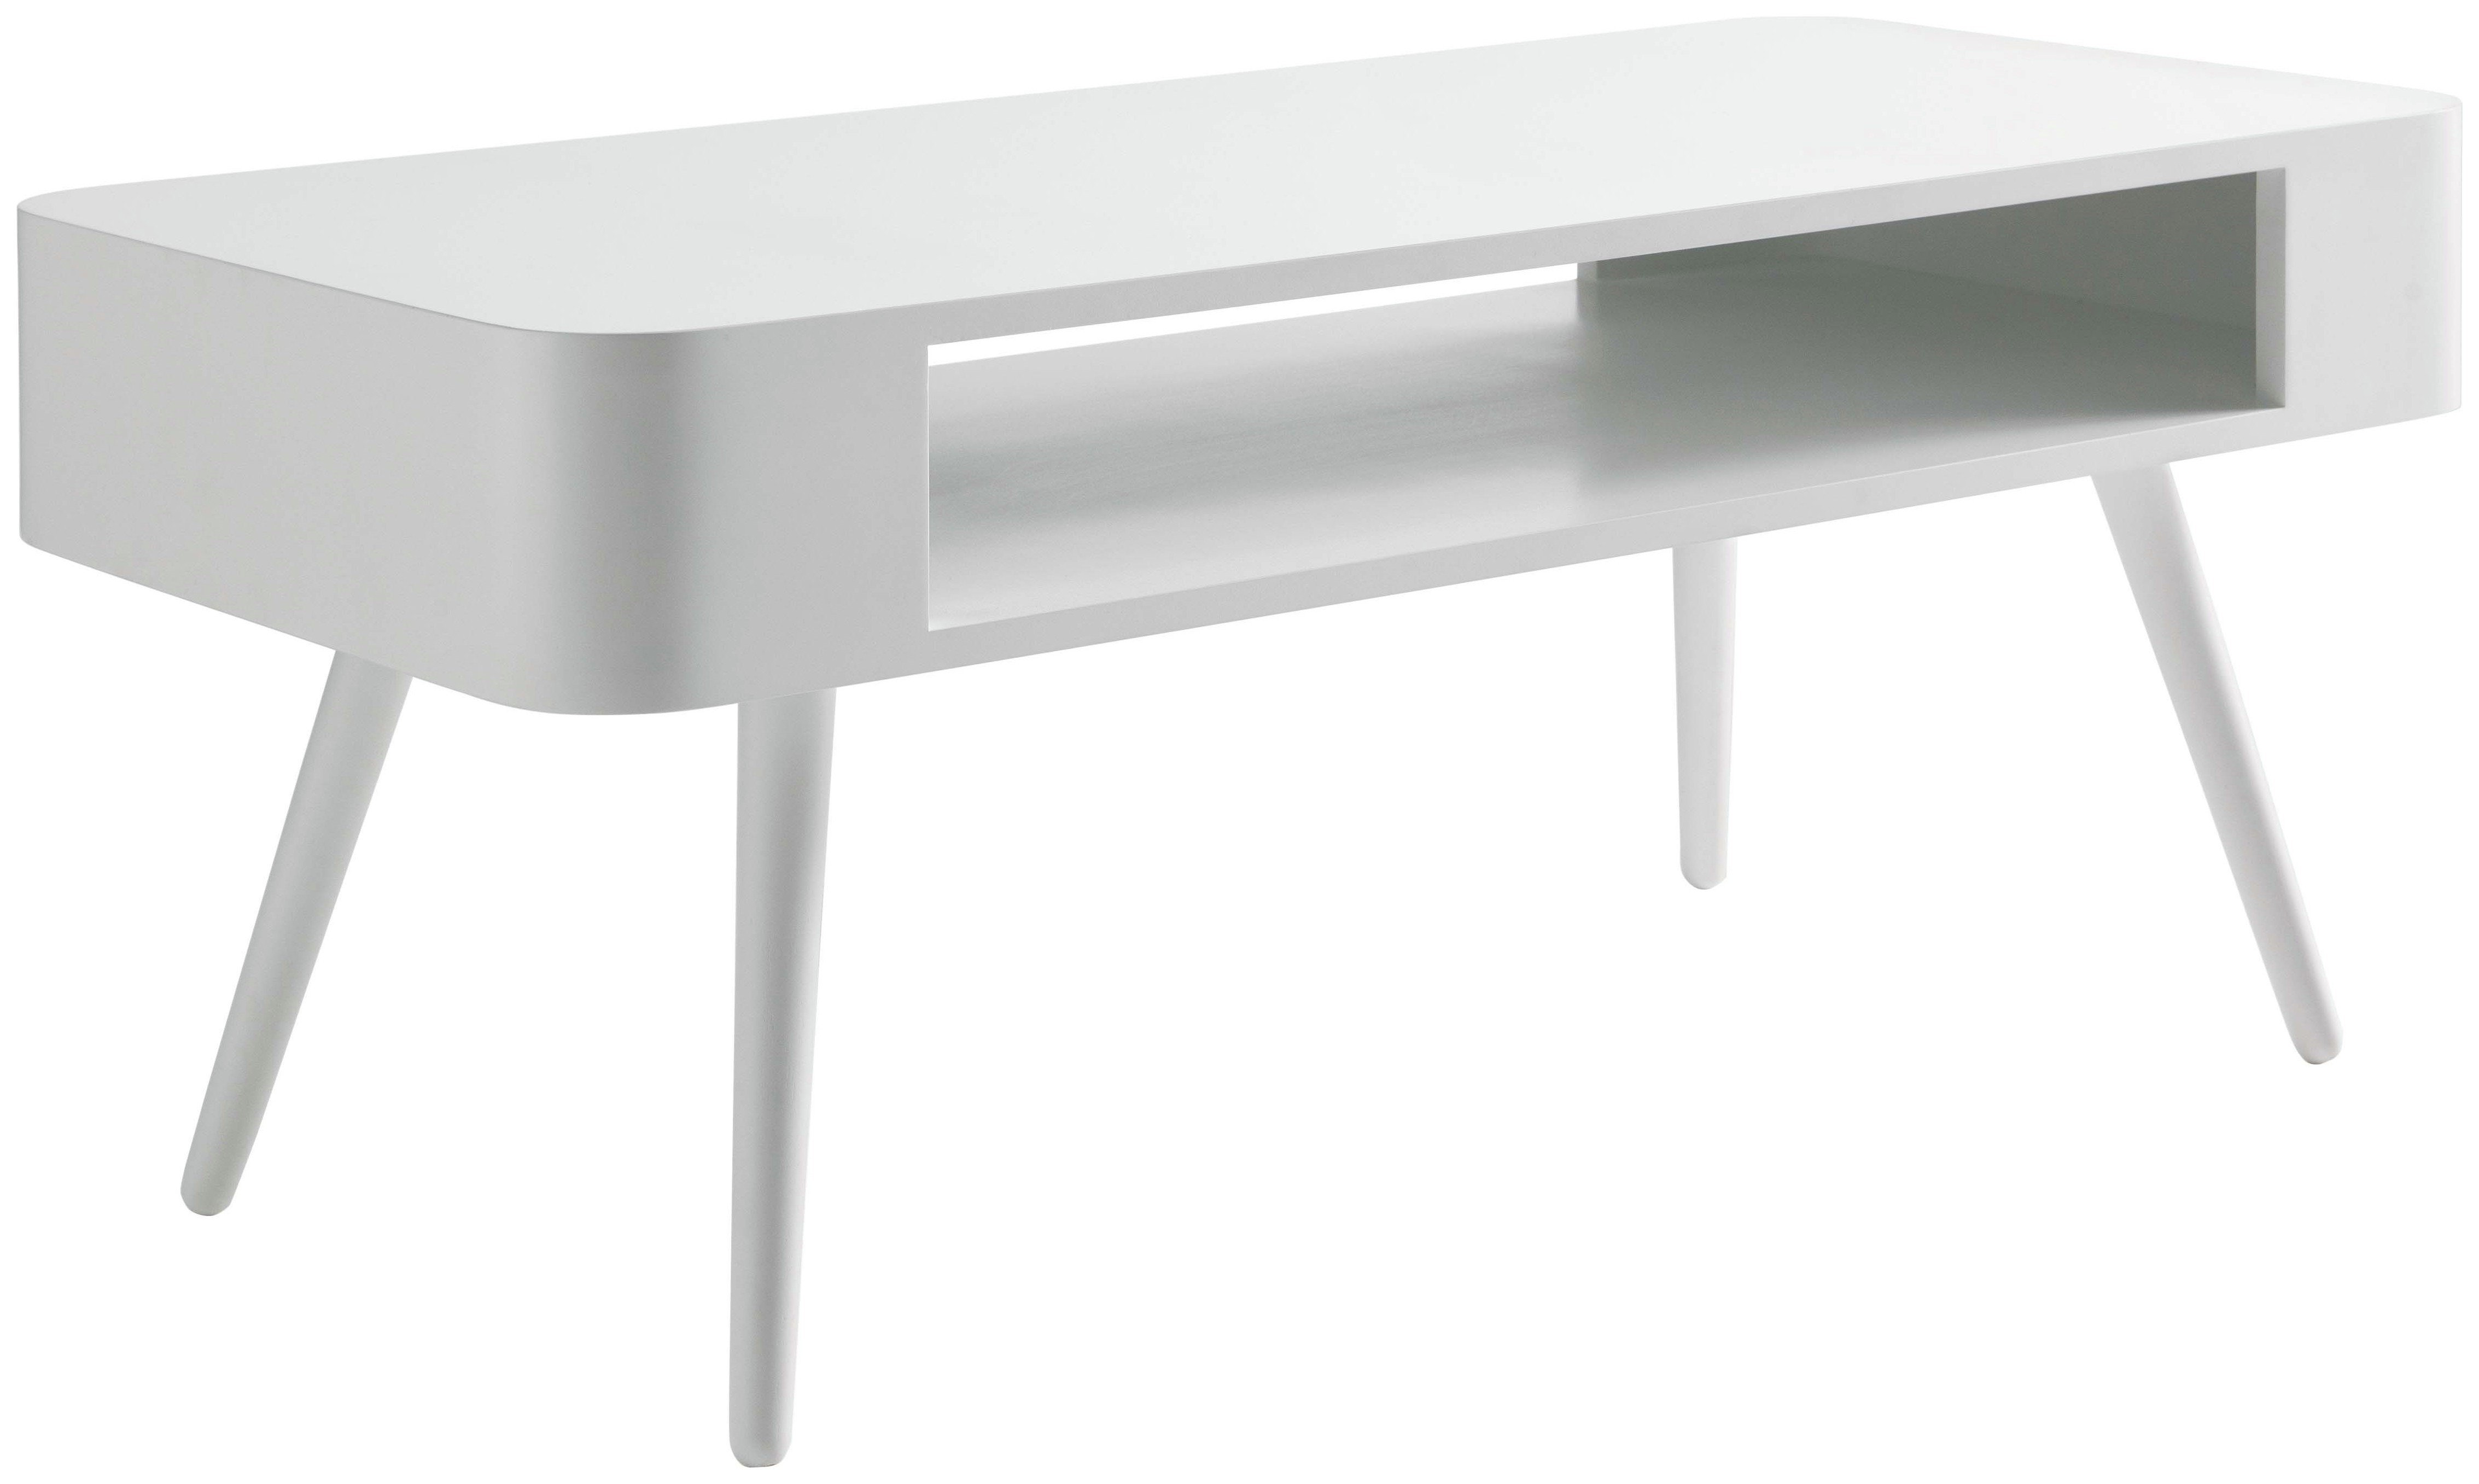 Habitat Bumble Coffee Table - White